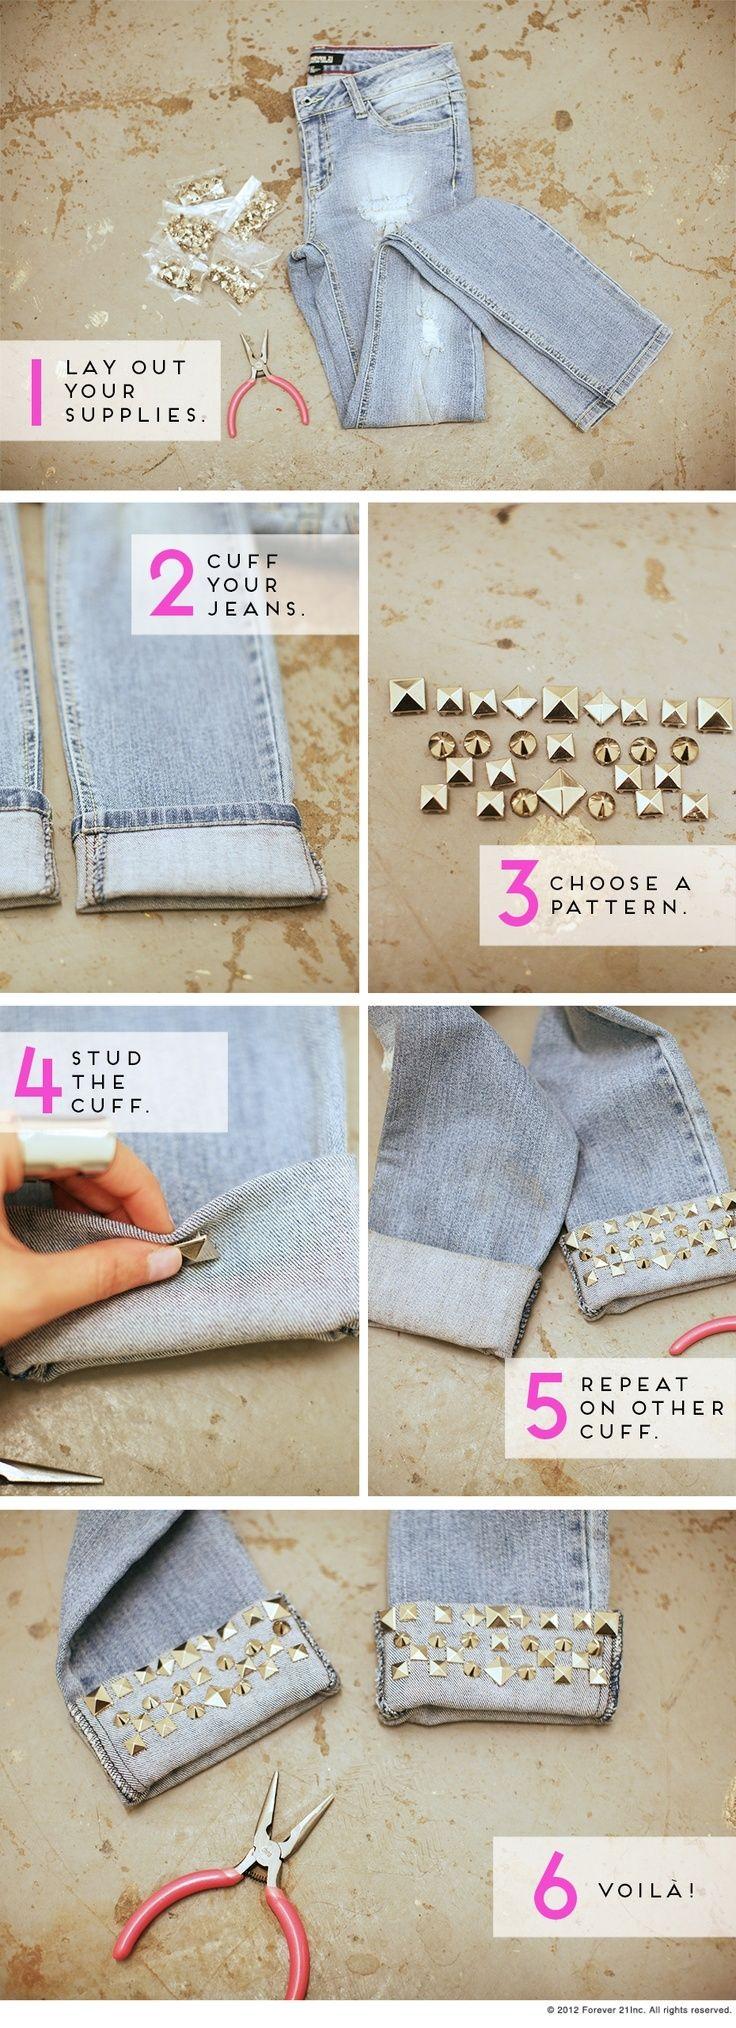 DIY Ideias para customizar seu jeans.